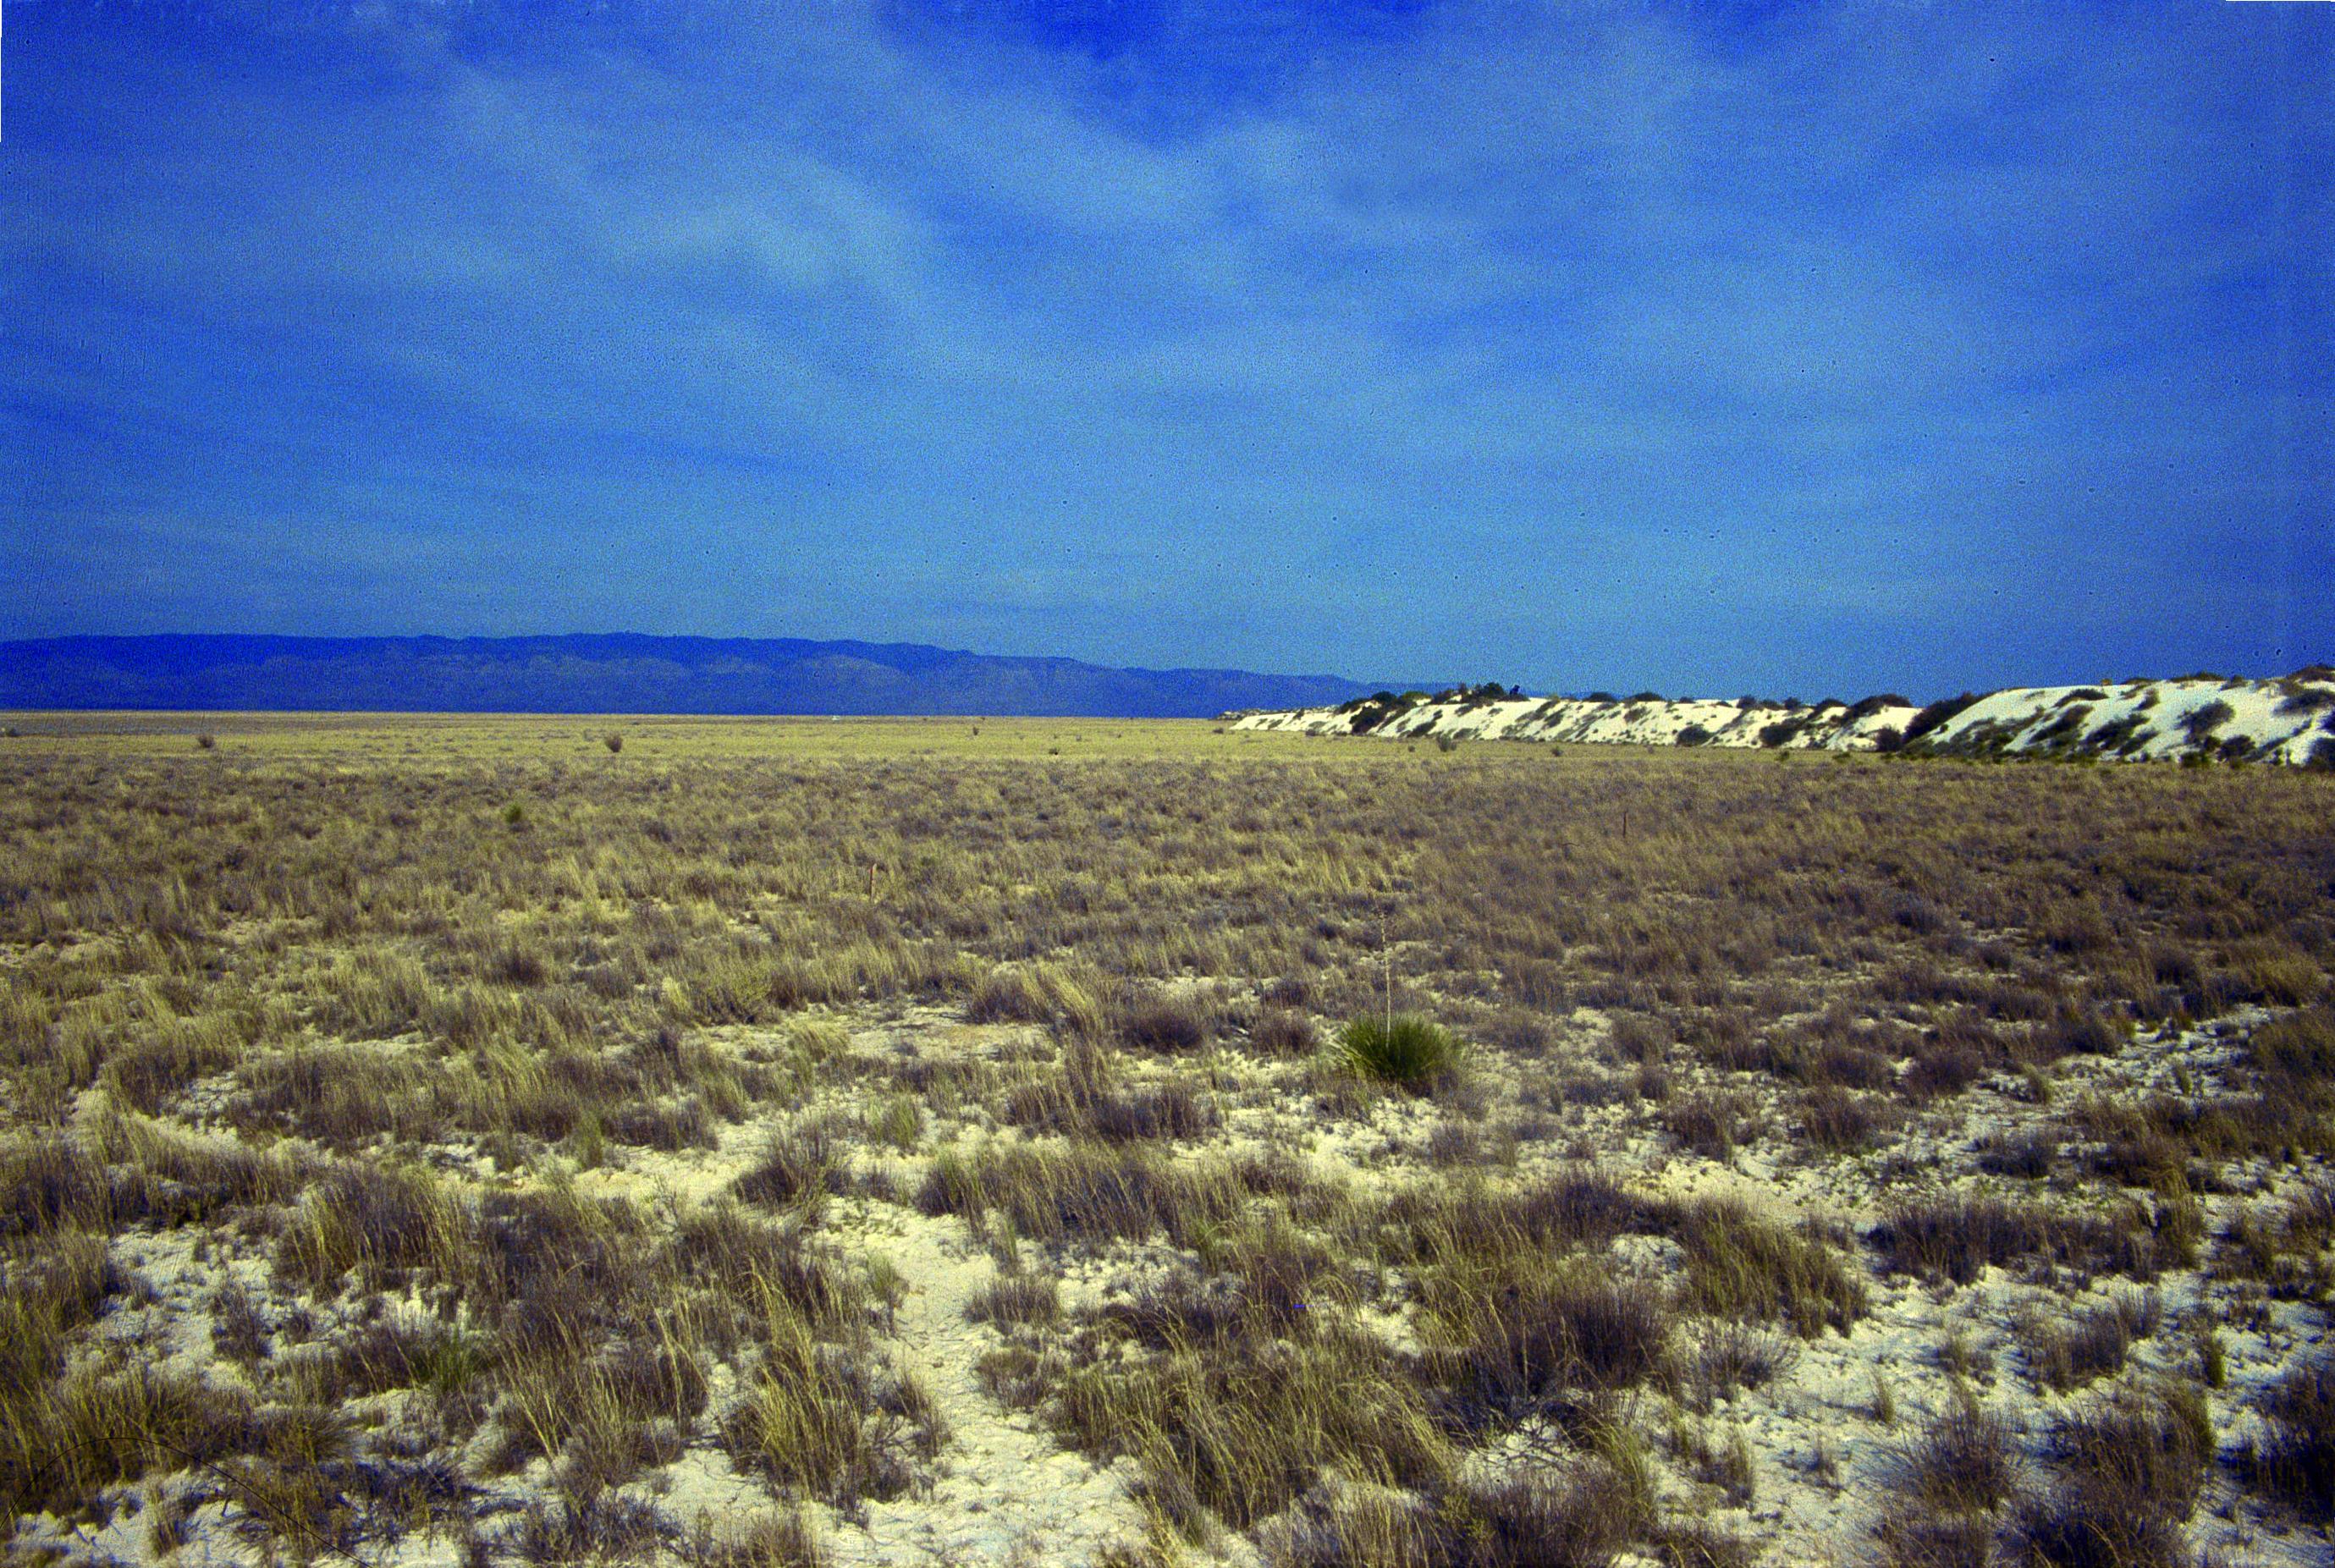 Desierto de White Sands